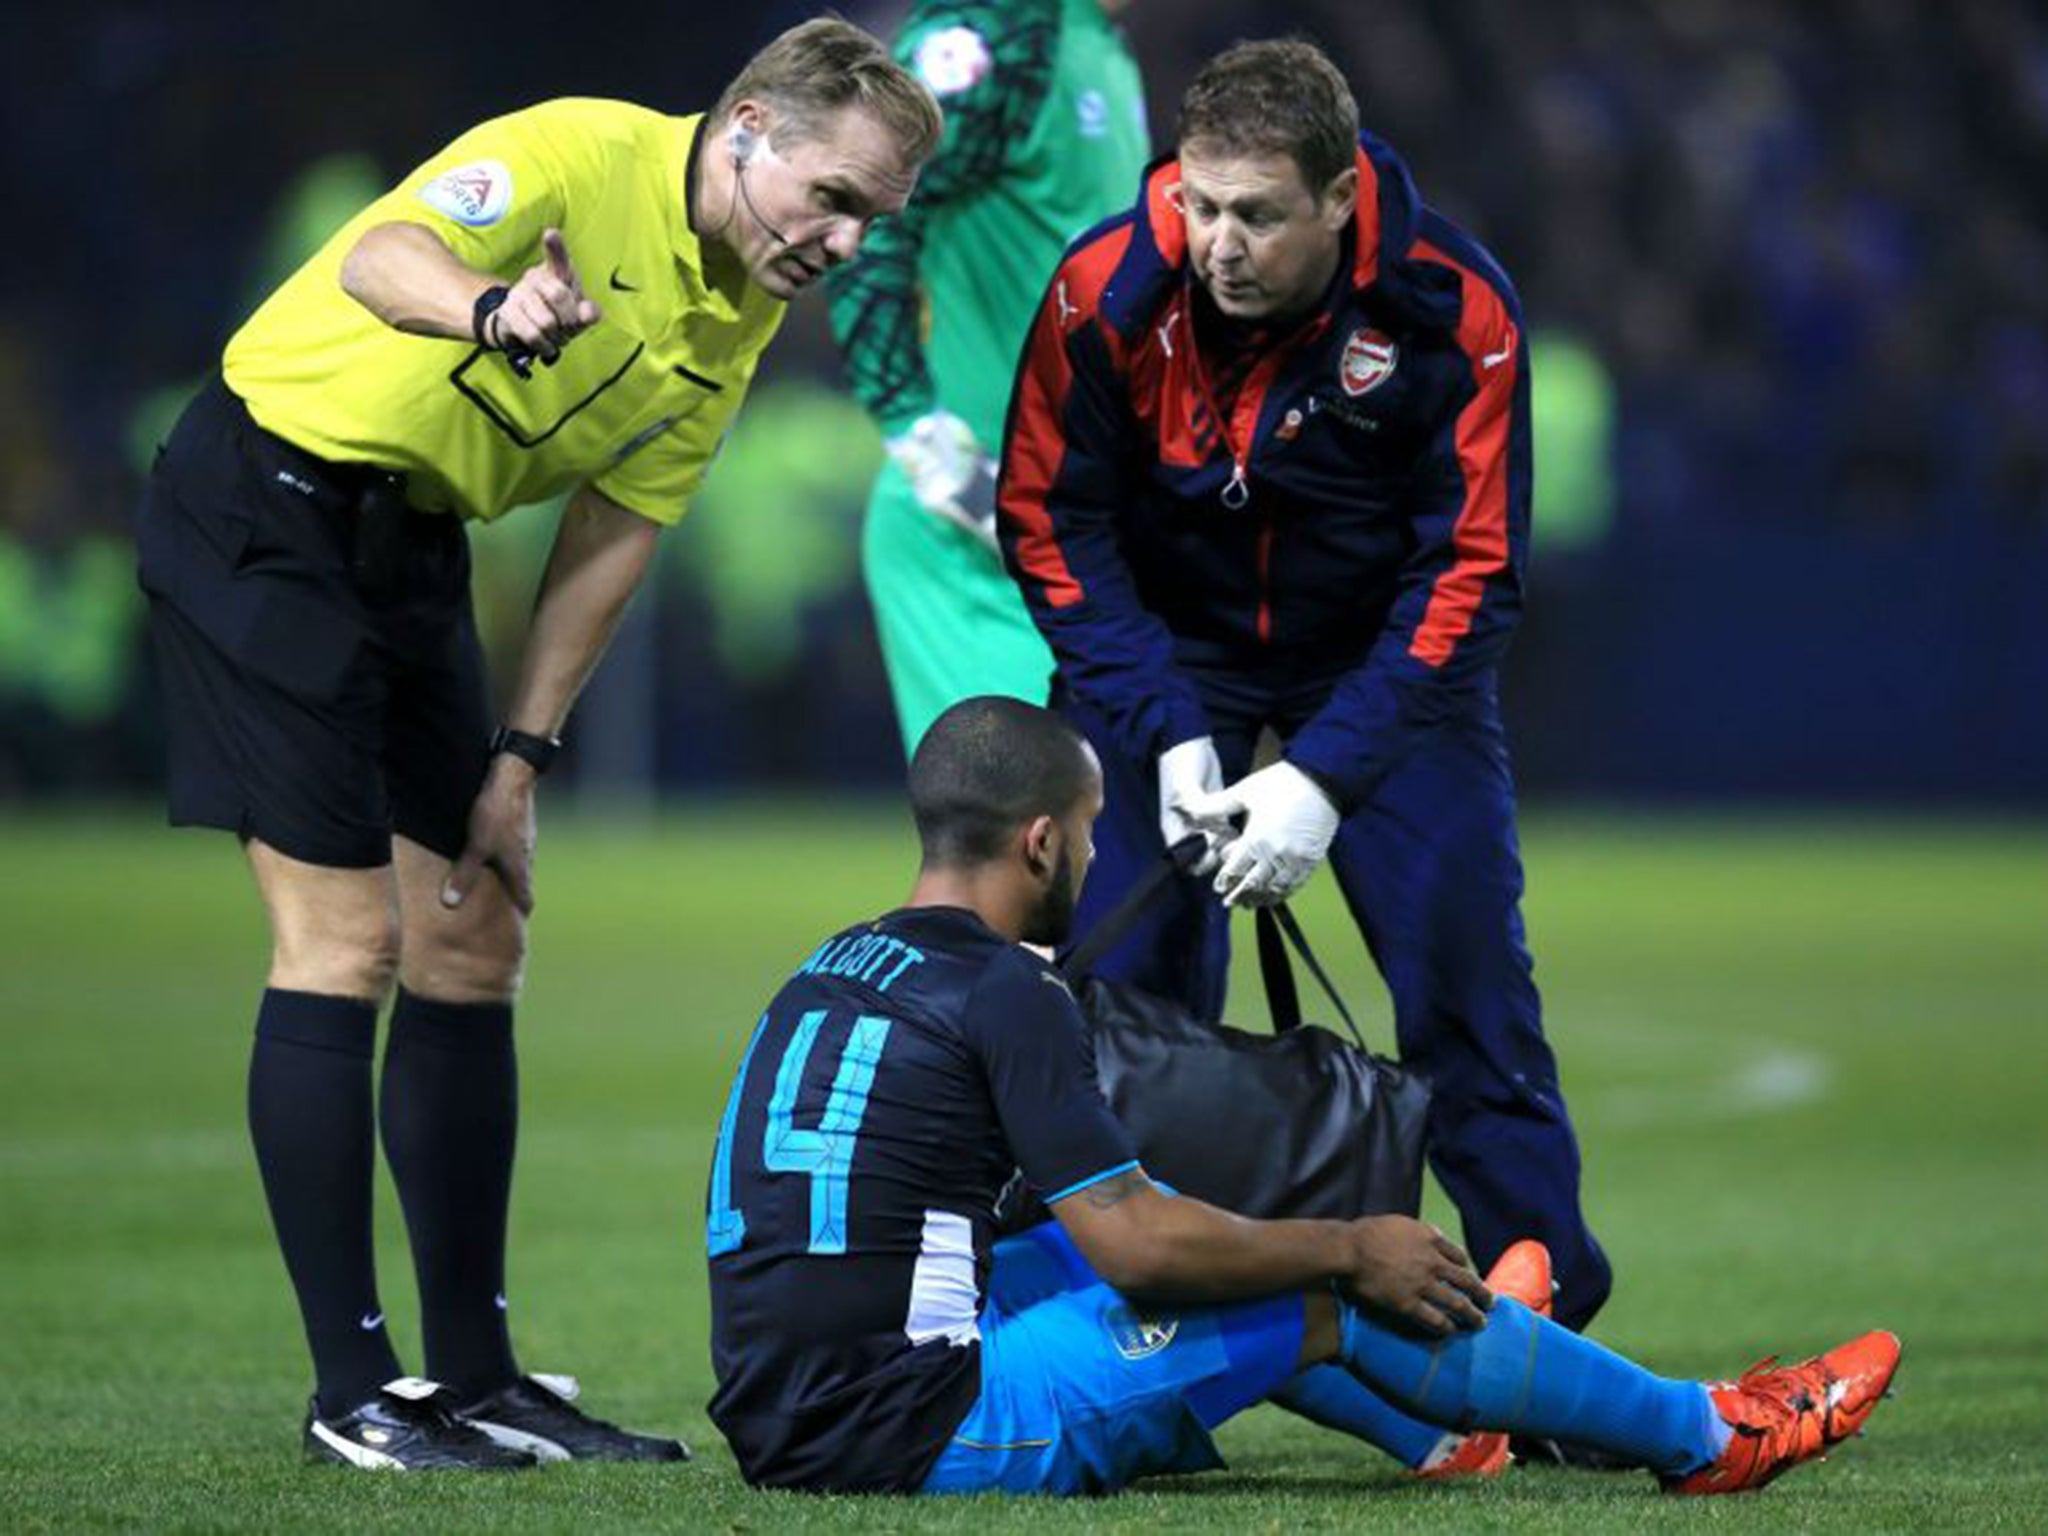 Arsenal injury news: Theo Walcott and Alex Oxlade-Chamberlain to miss crucial games against Tottenham and Bayern Munich